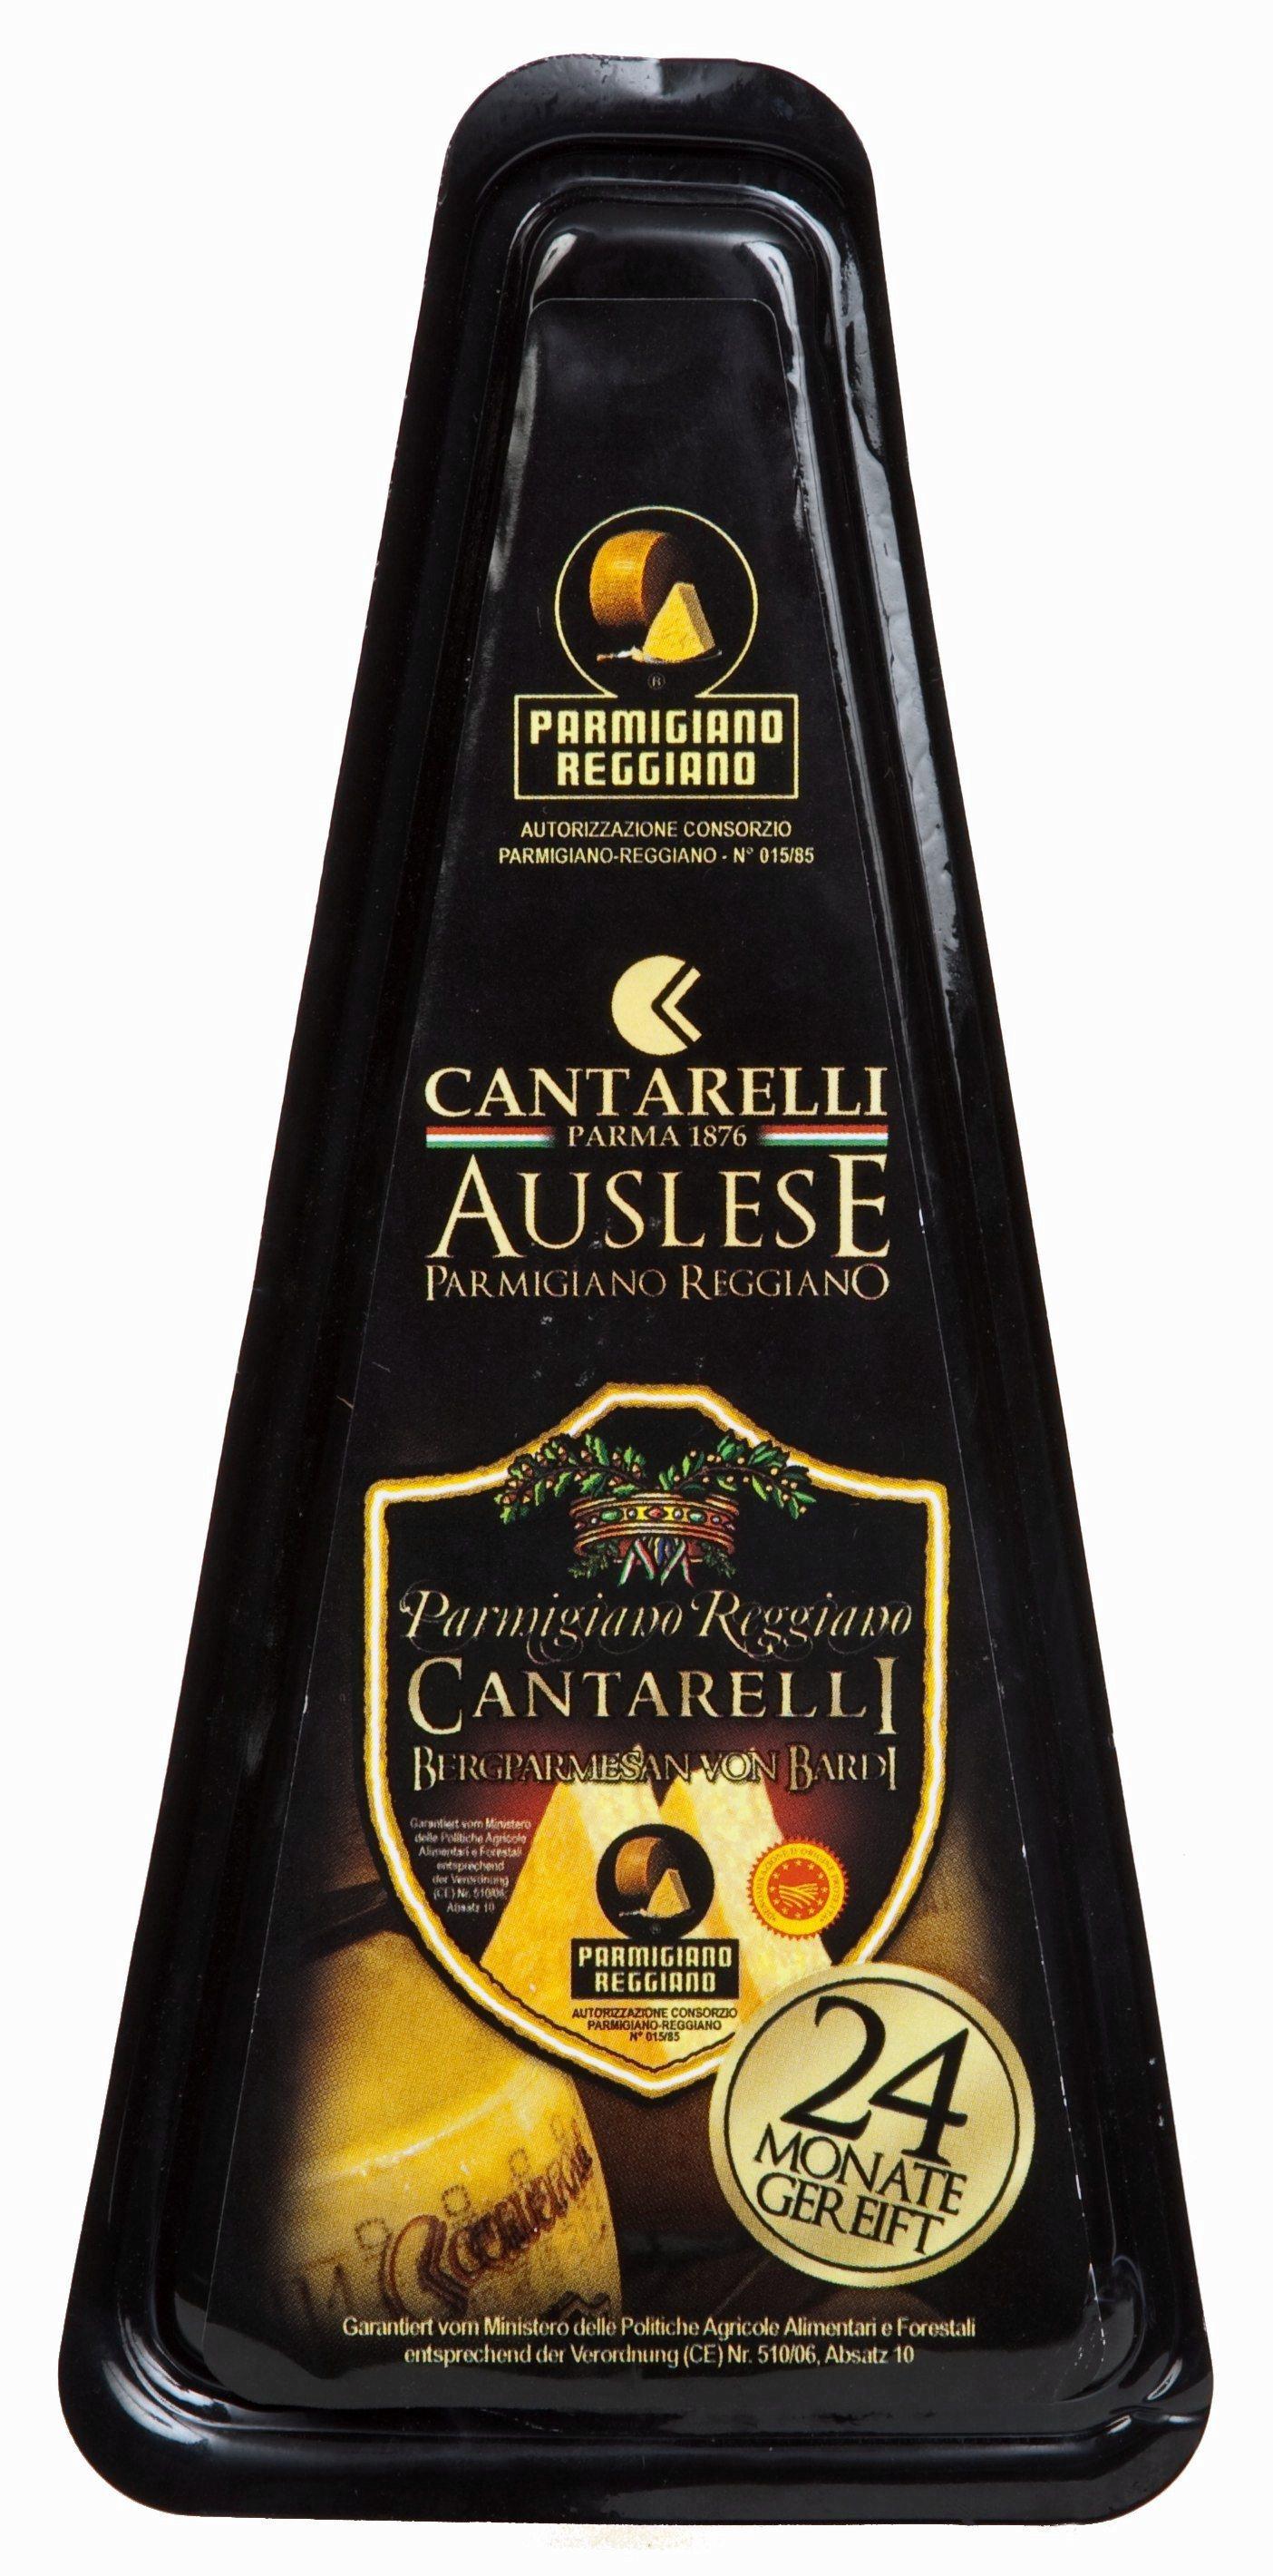 Parmigiano Reggiano Bardi 24 mesi 200 g Cantarelli Berg Parmesankäse 24 Monate gereift  ( Kühlartikel)